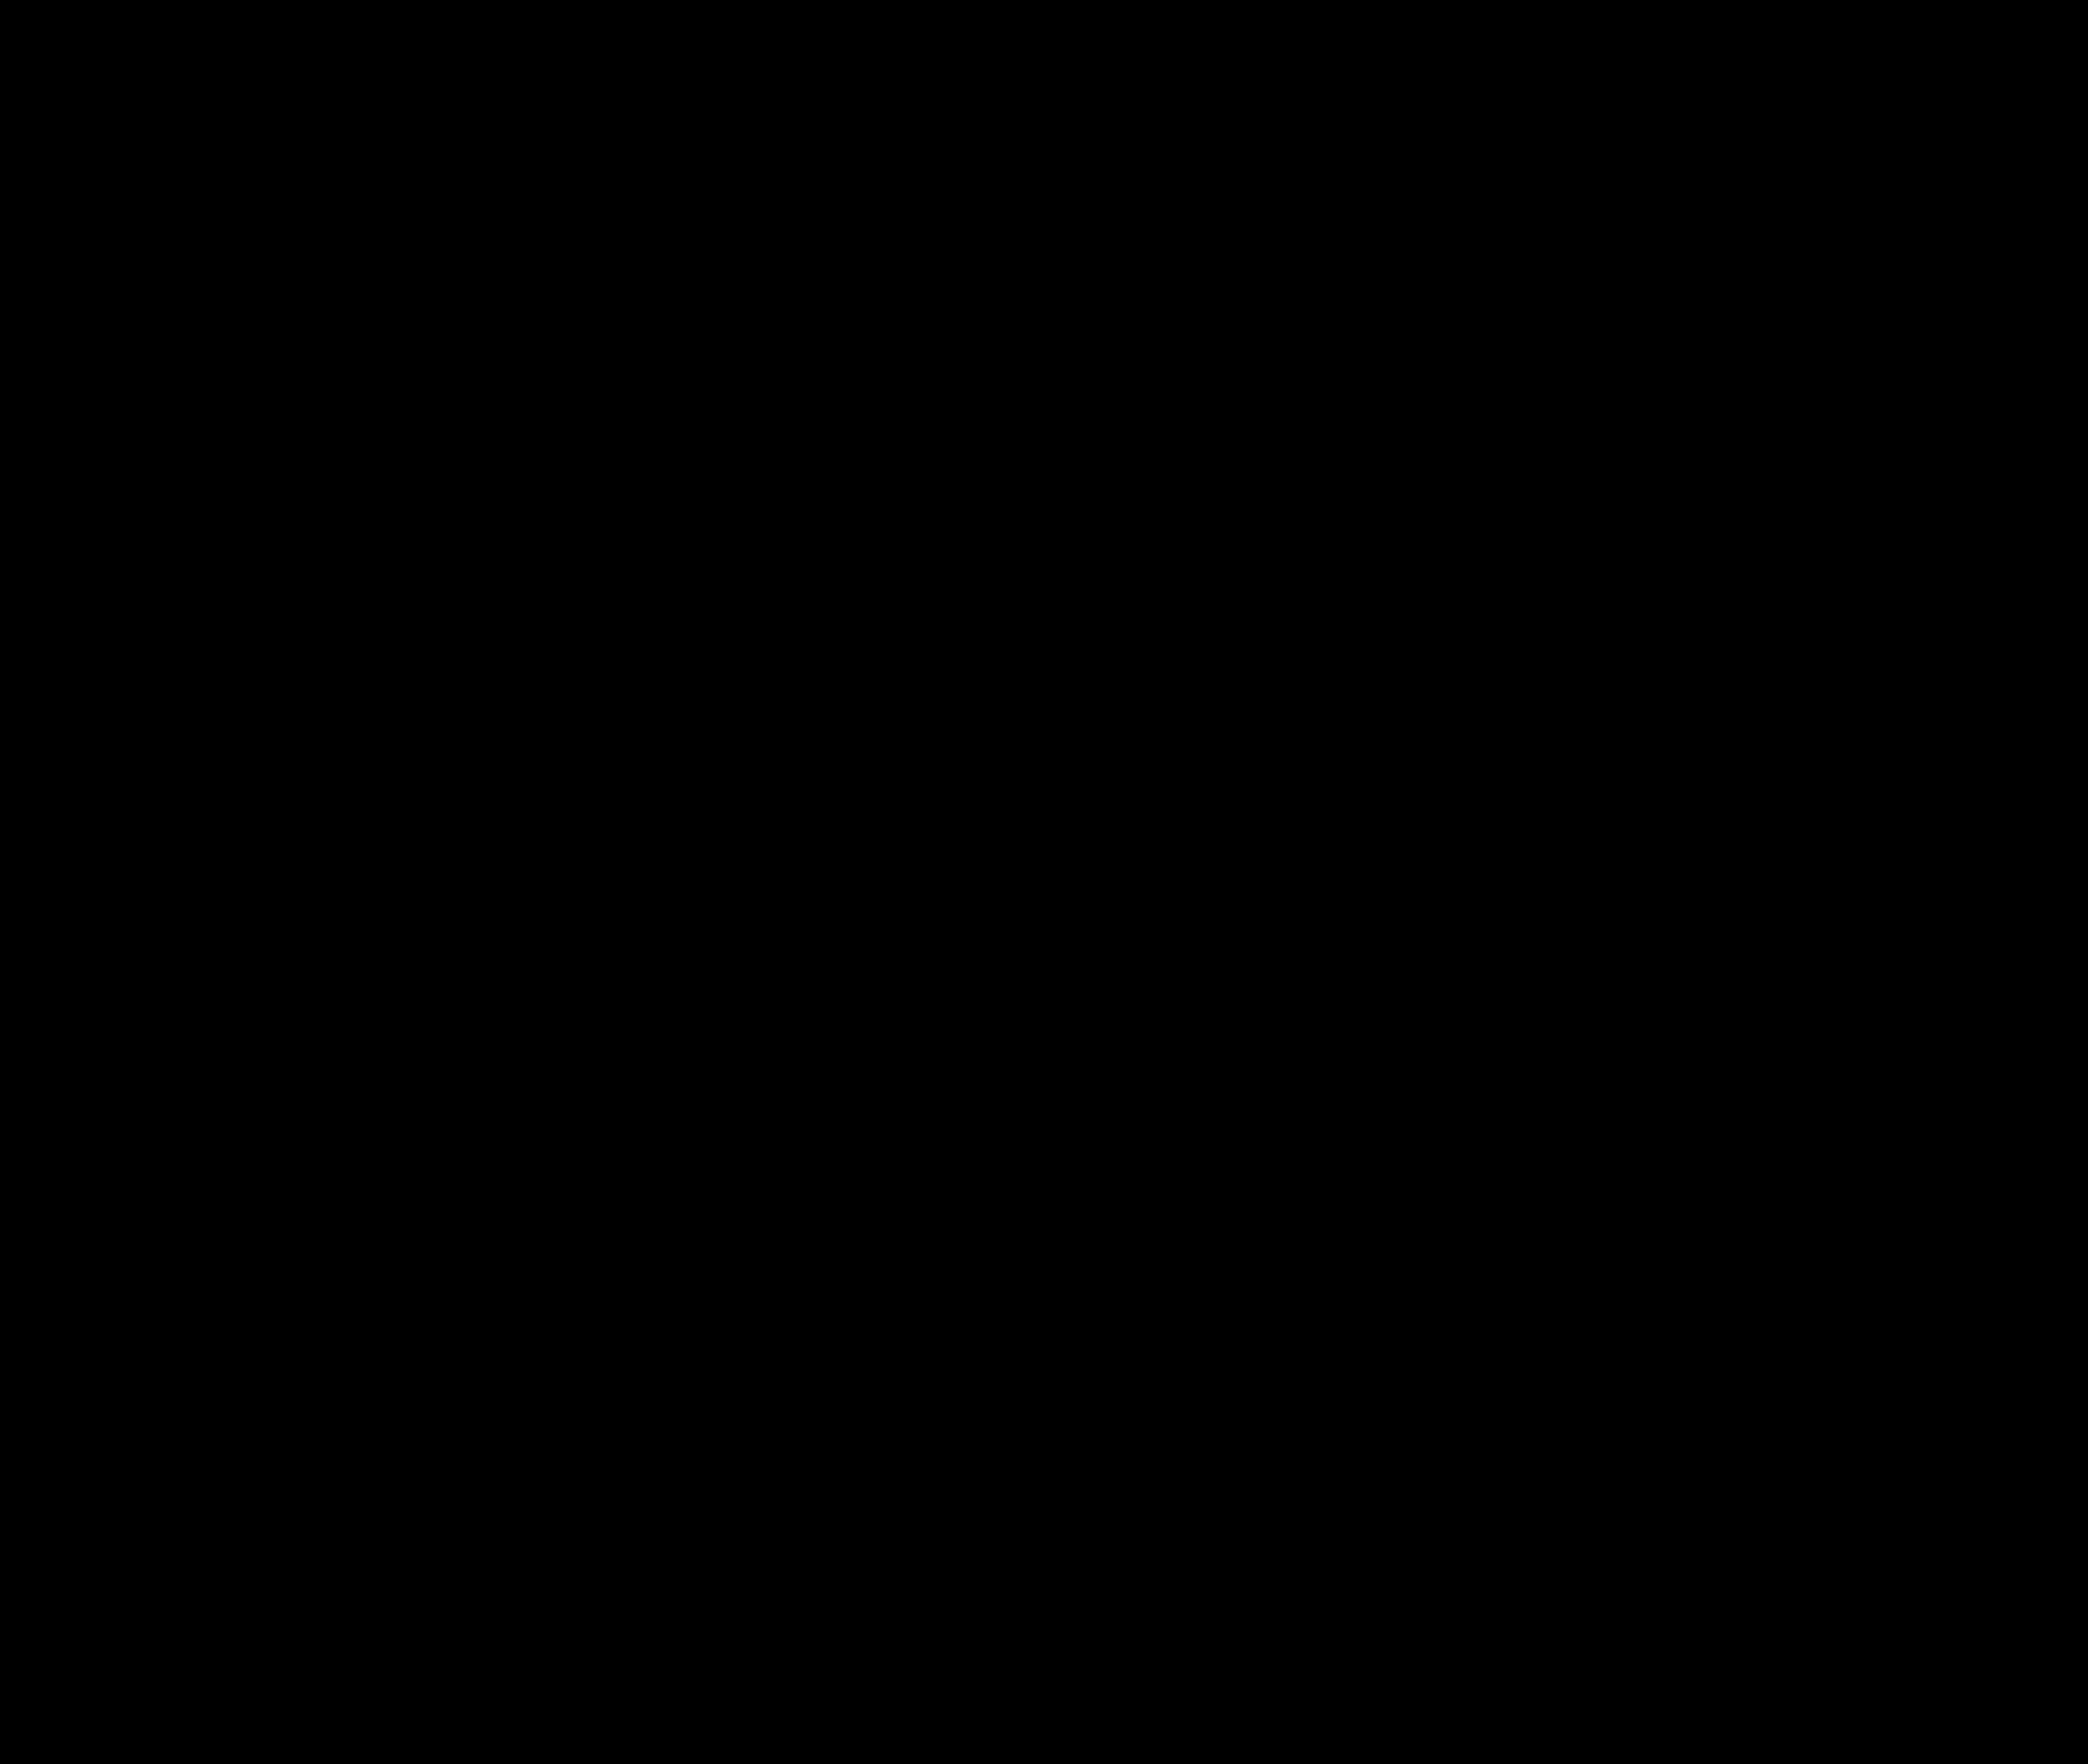 Clip art Marine mammal Silhouette Black M.